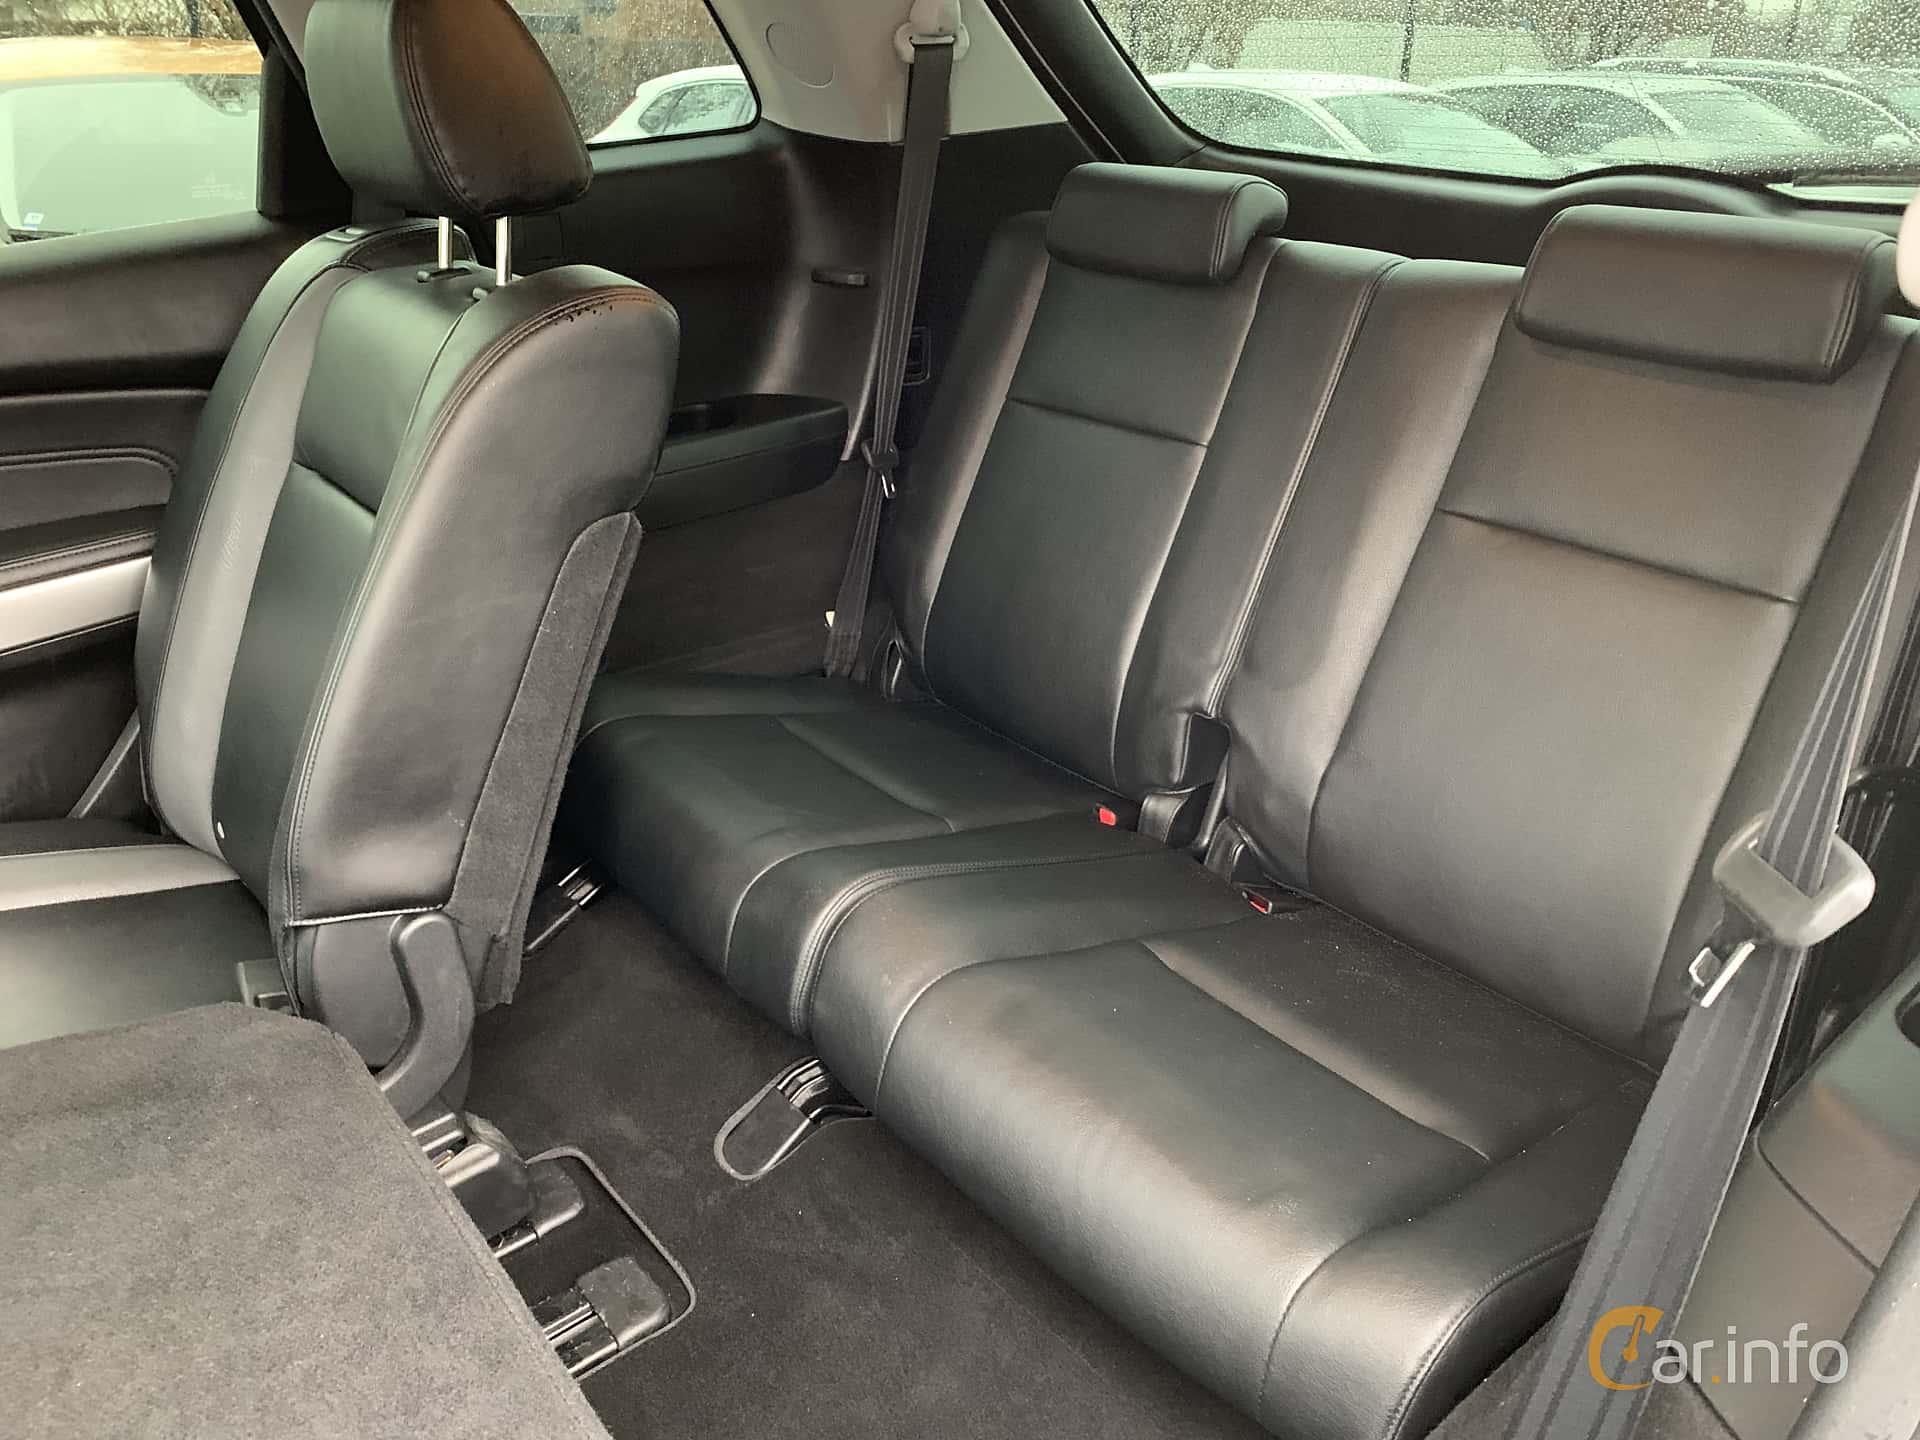 Mazda CX-9 3.7 AWD Automatic, 276hp, 2008